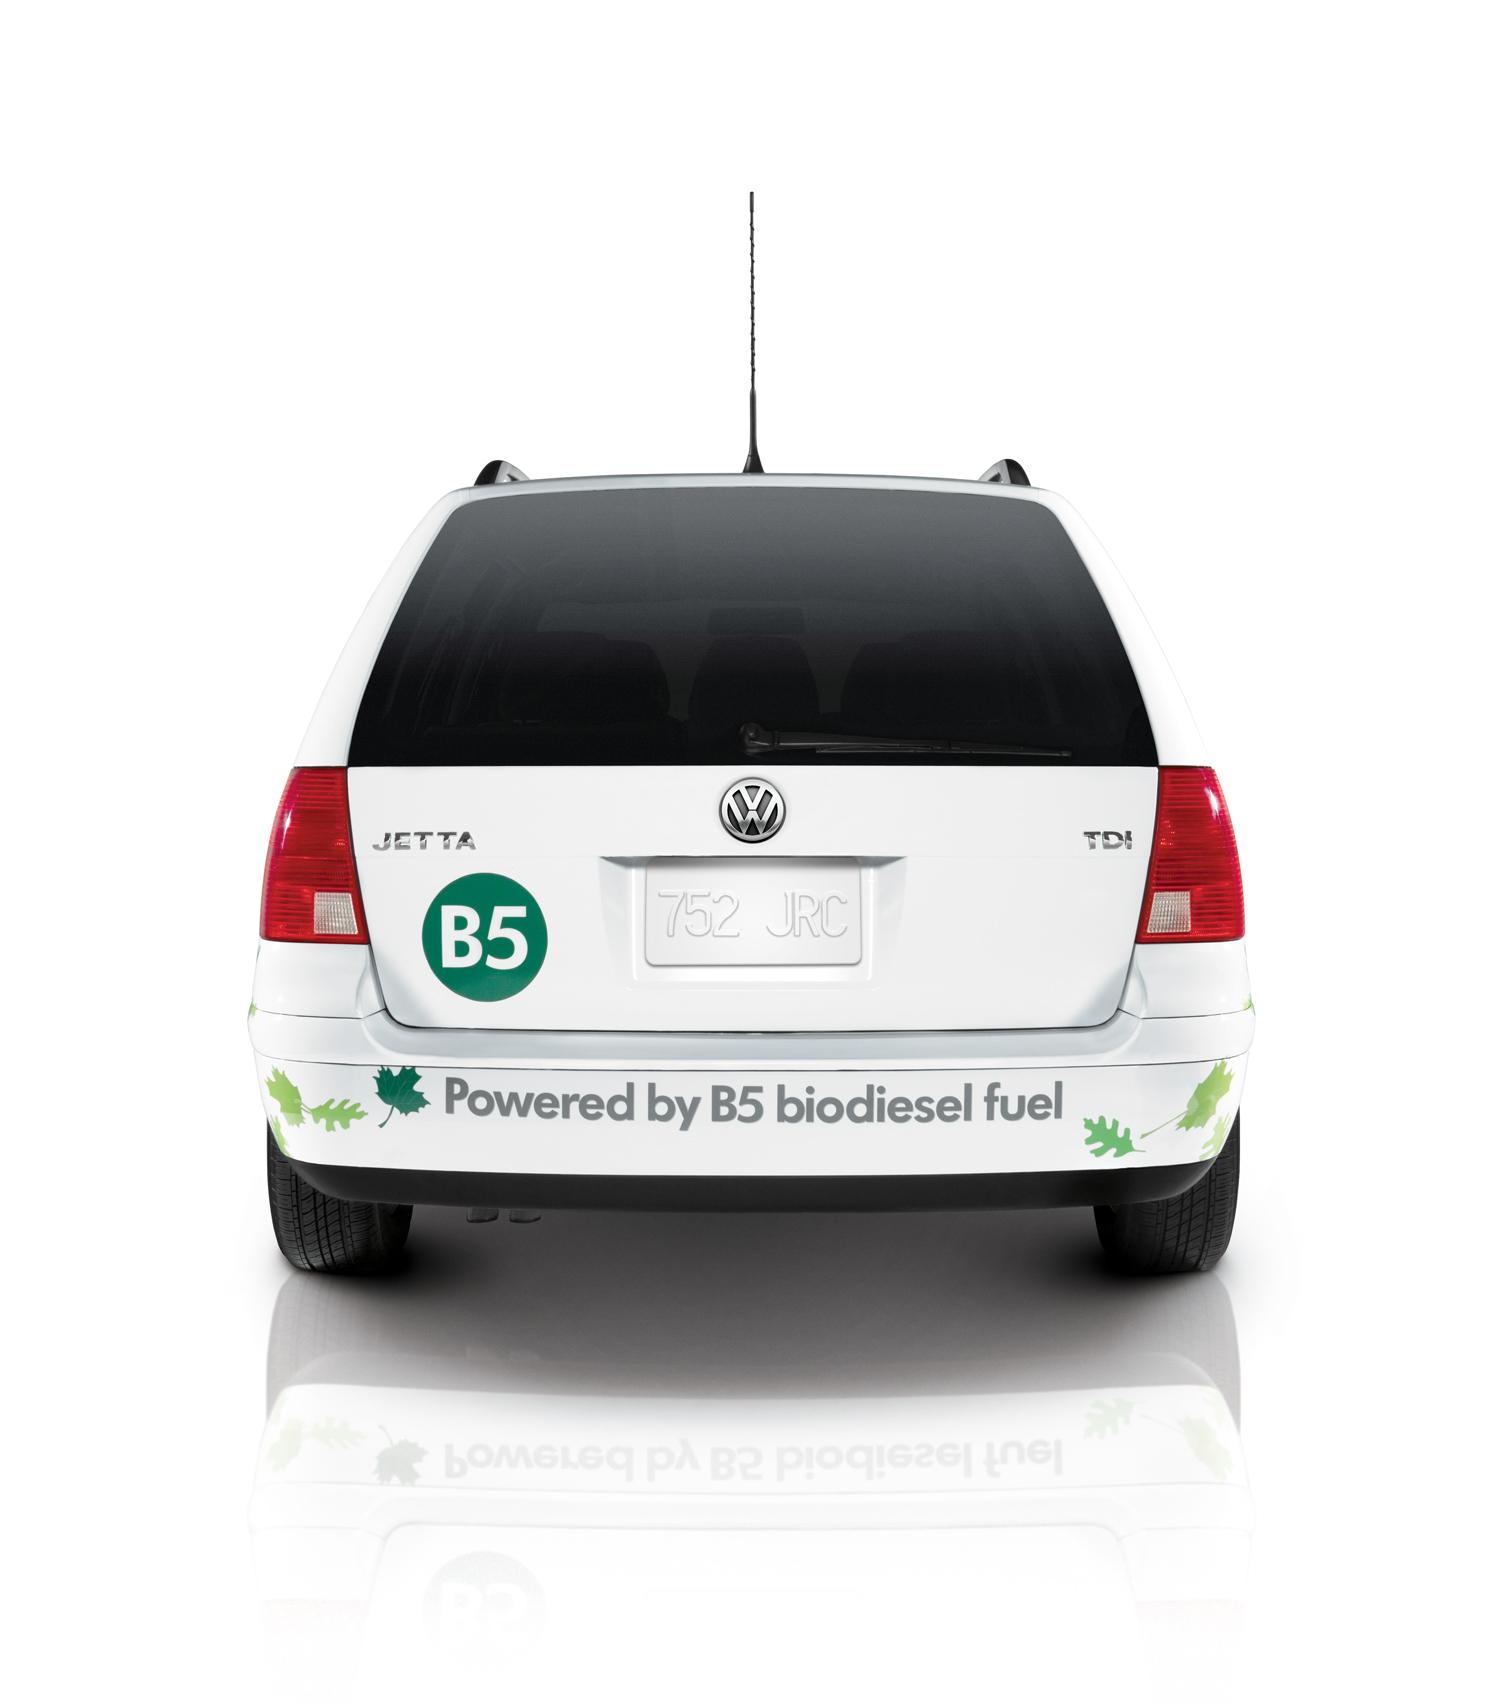 Volkswagen, Jetta BioDiesel TDI, rear view